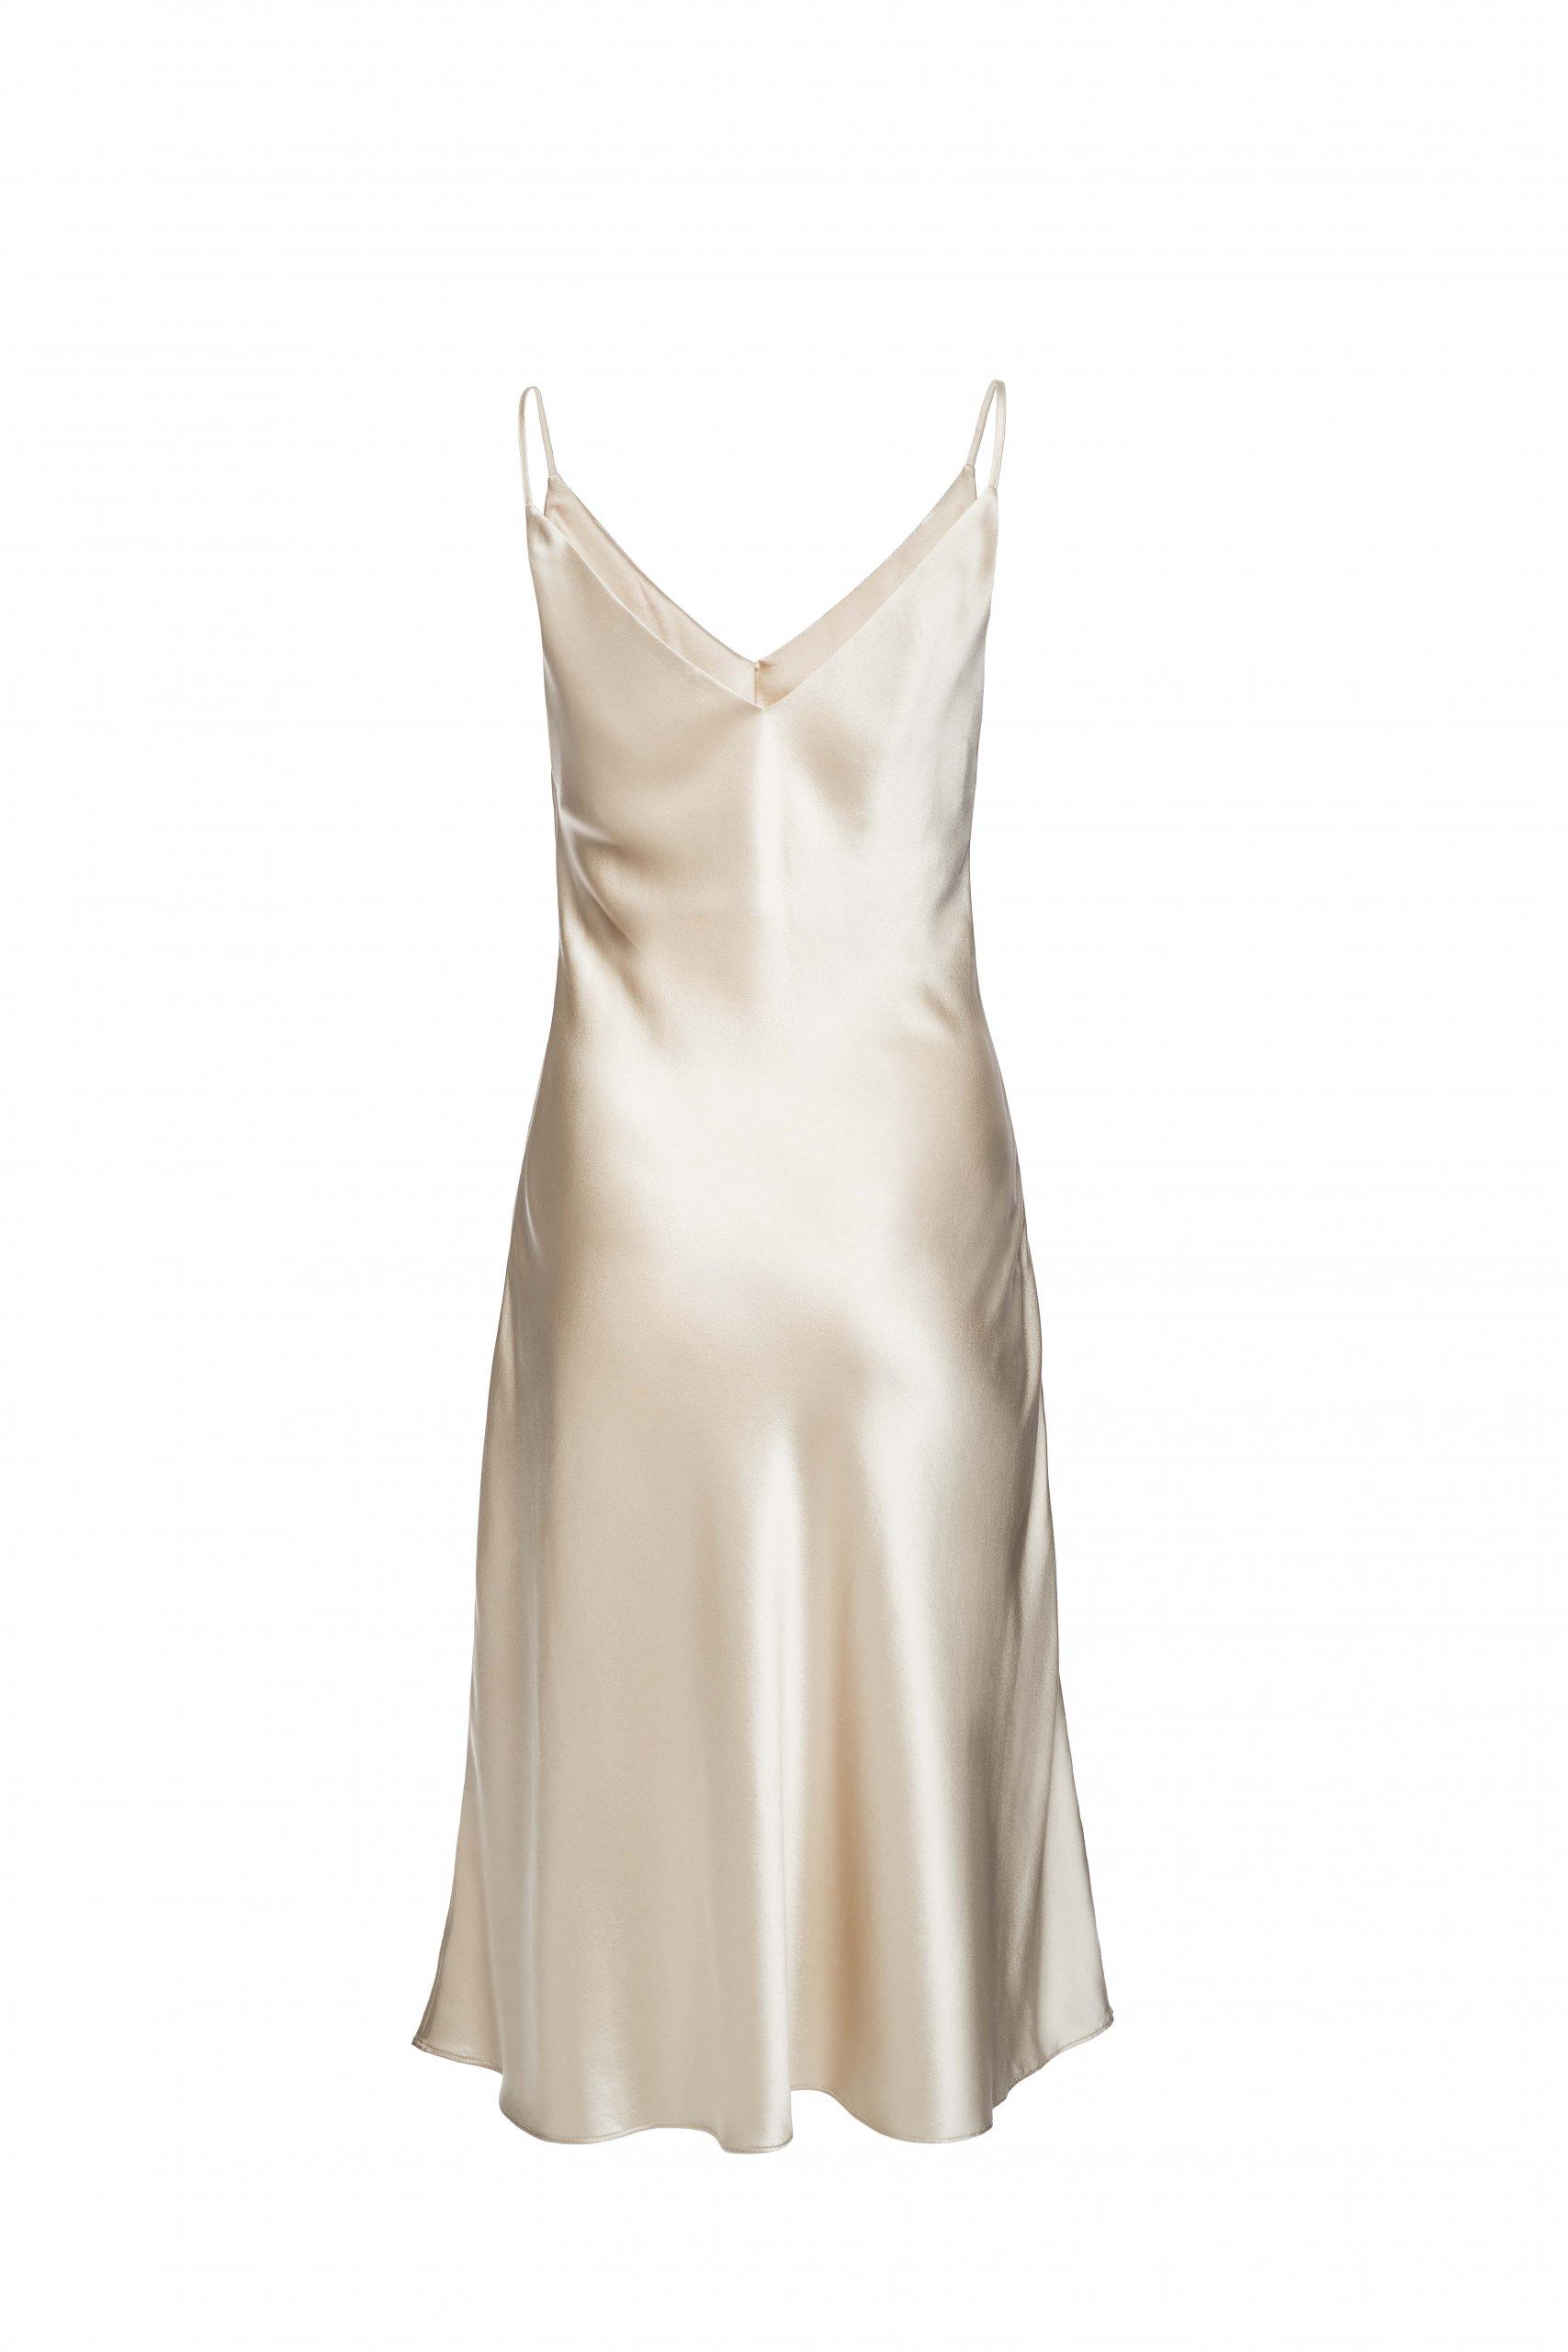 Jedwabna Sukienka Midi Champagne